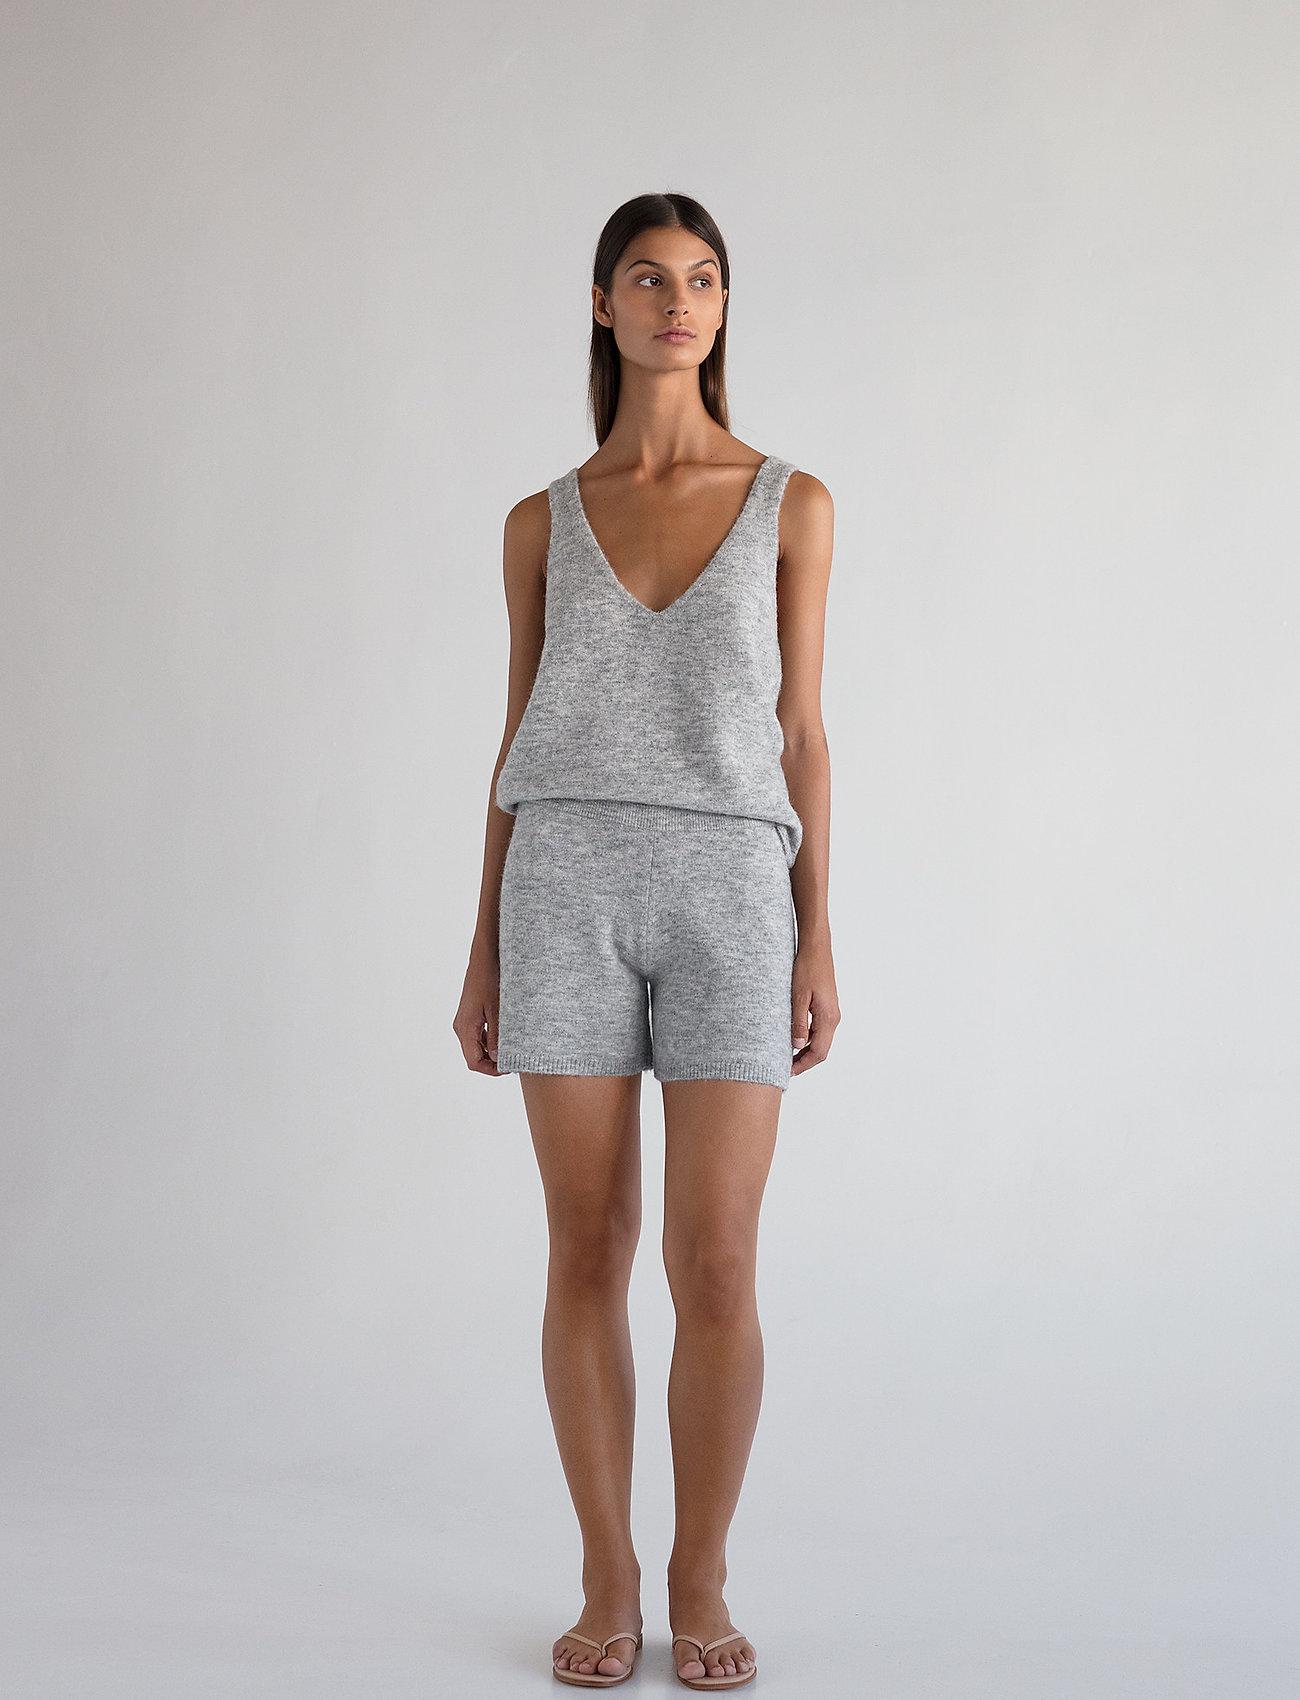 Stylein - ETOILE TOP - tops zonder mouwen - light grey - 0